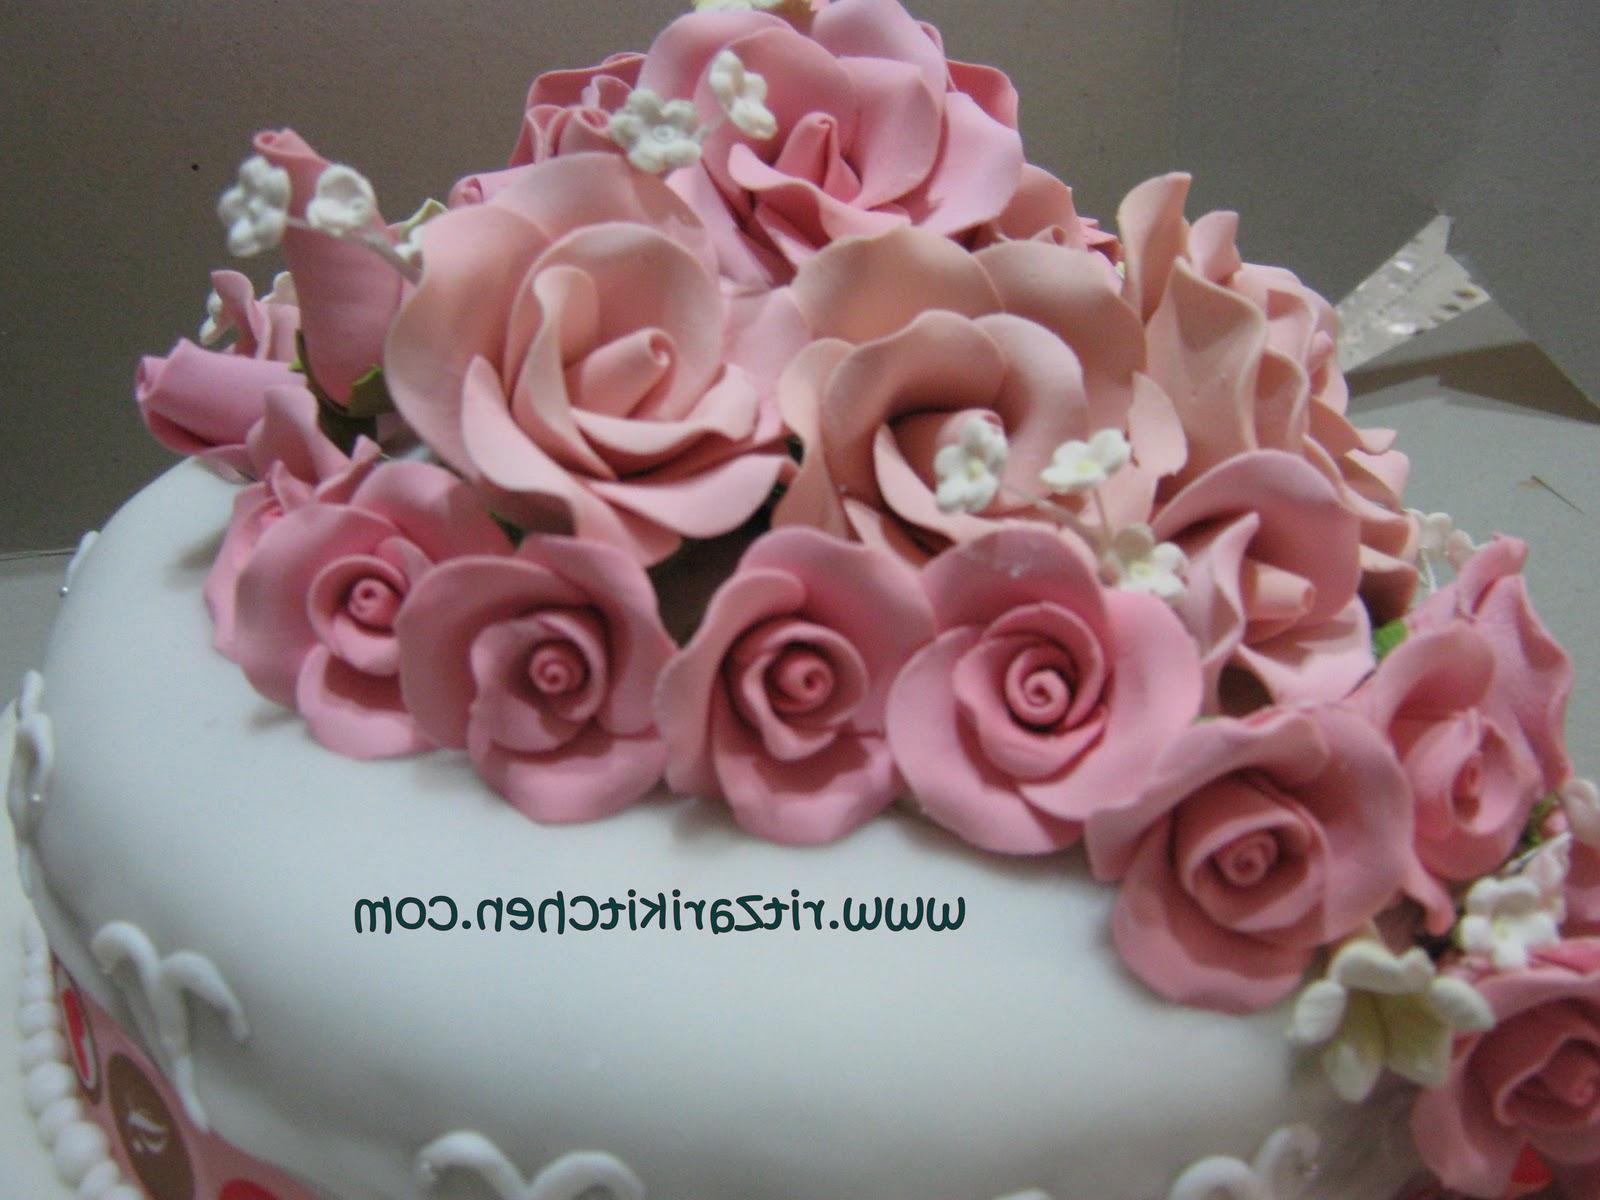 design of wedding cake,